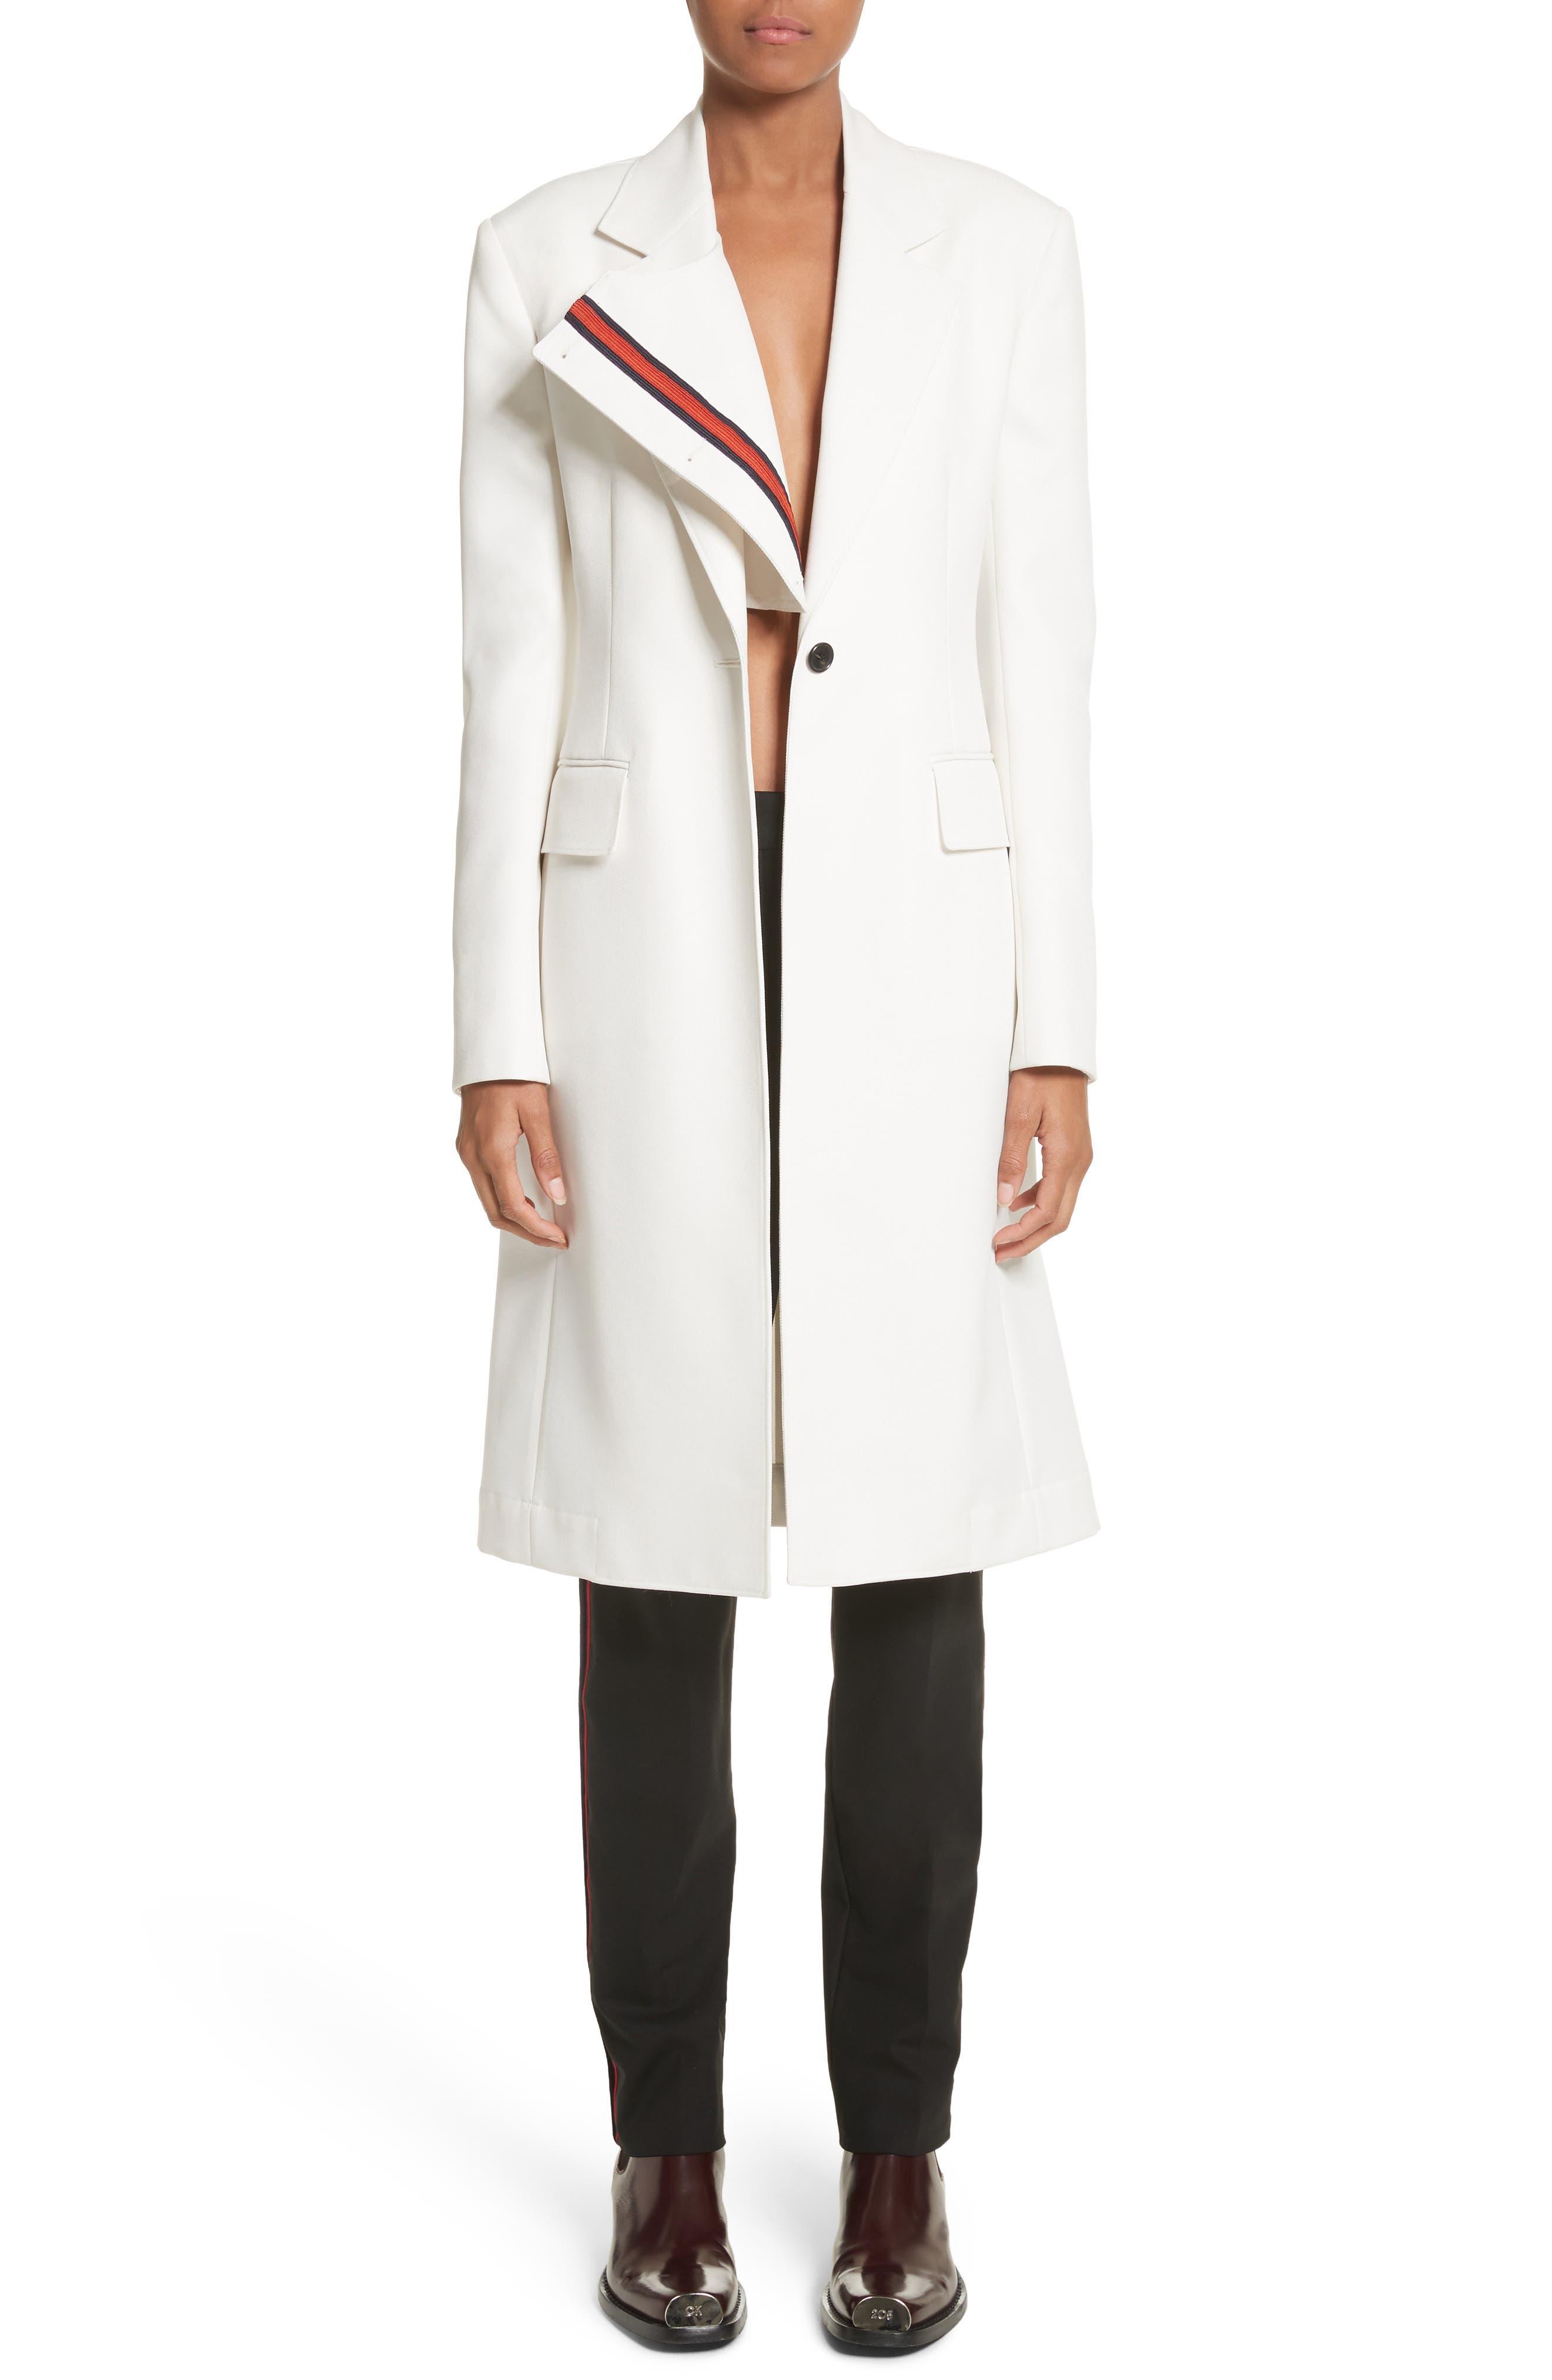 Main Image - CALVIN KLEIN 205W39NYC Uniform Stripe Coat